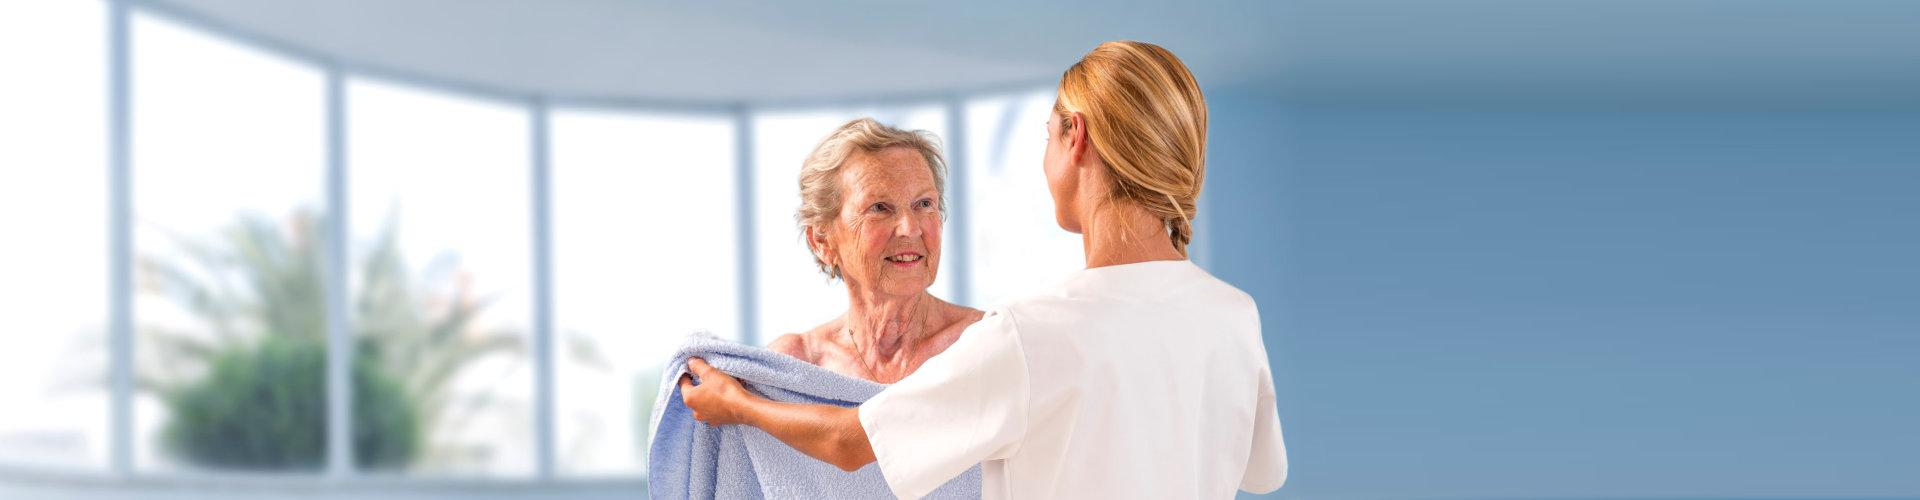 caregiver helping senior woman put on towel